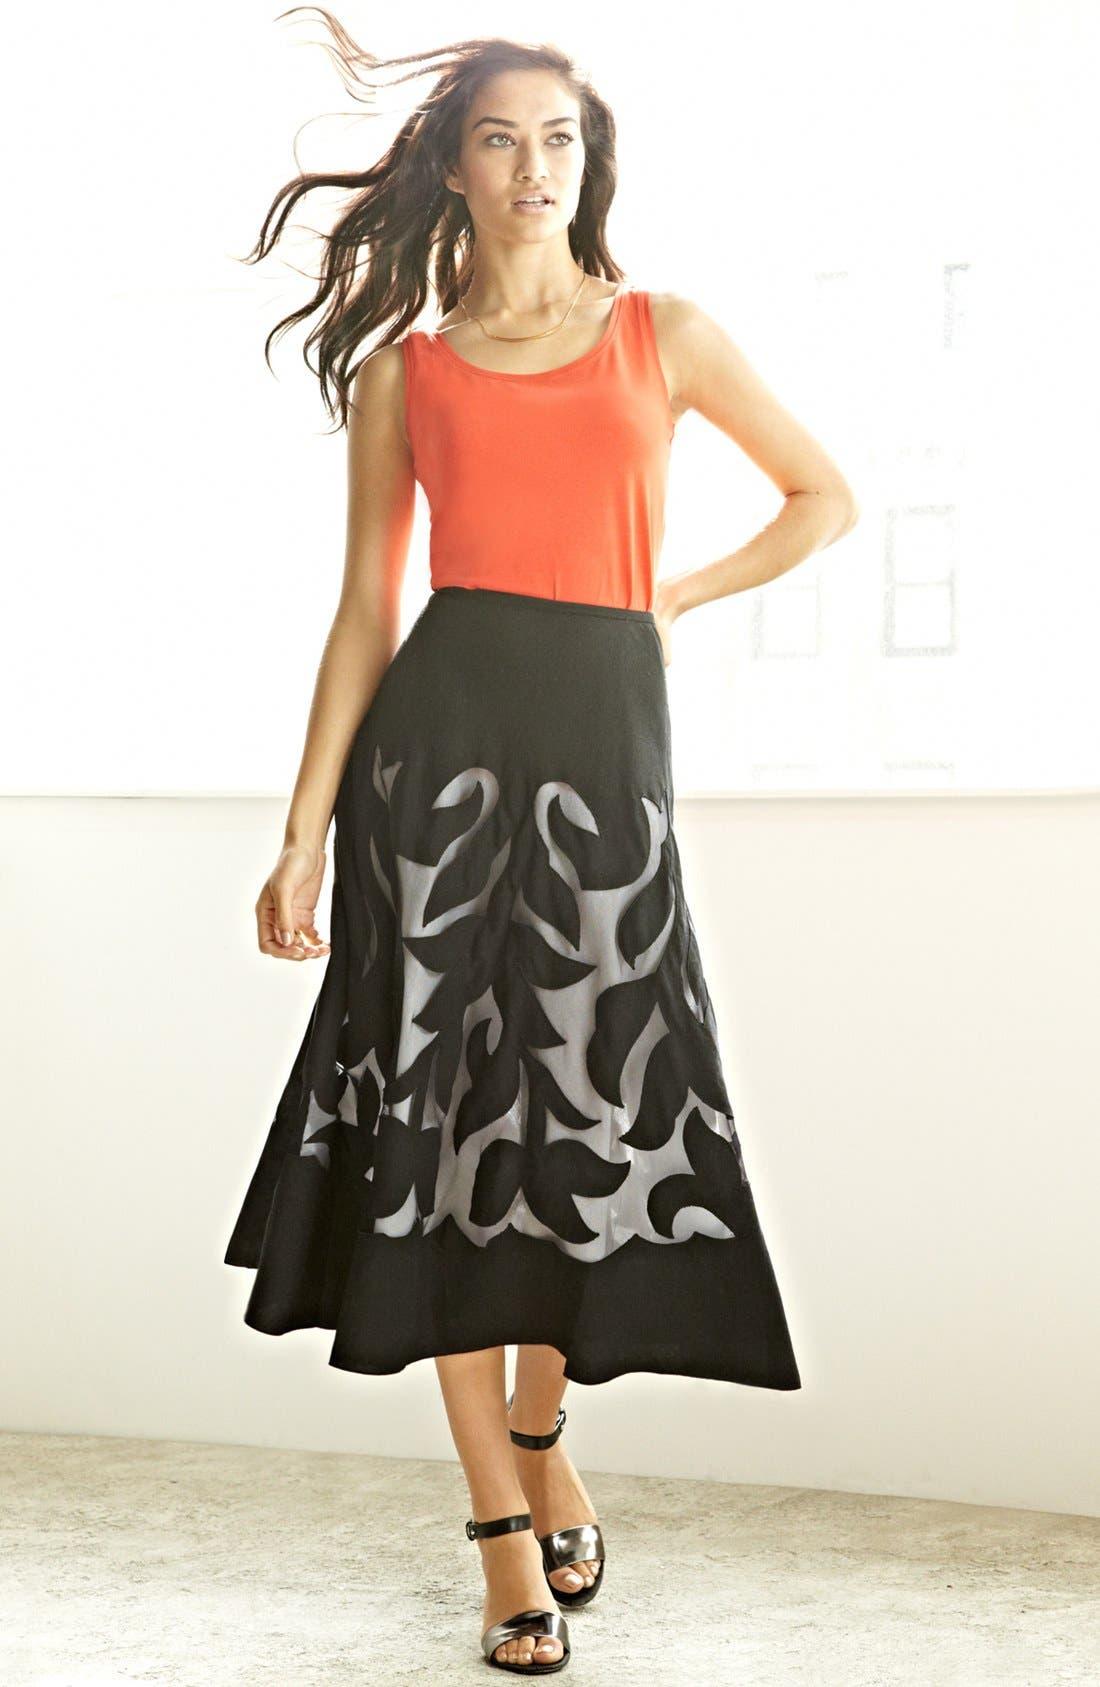 Alternate Image 1 Selected - Nic + Zoe Tank & Patio Skirt